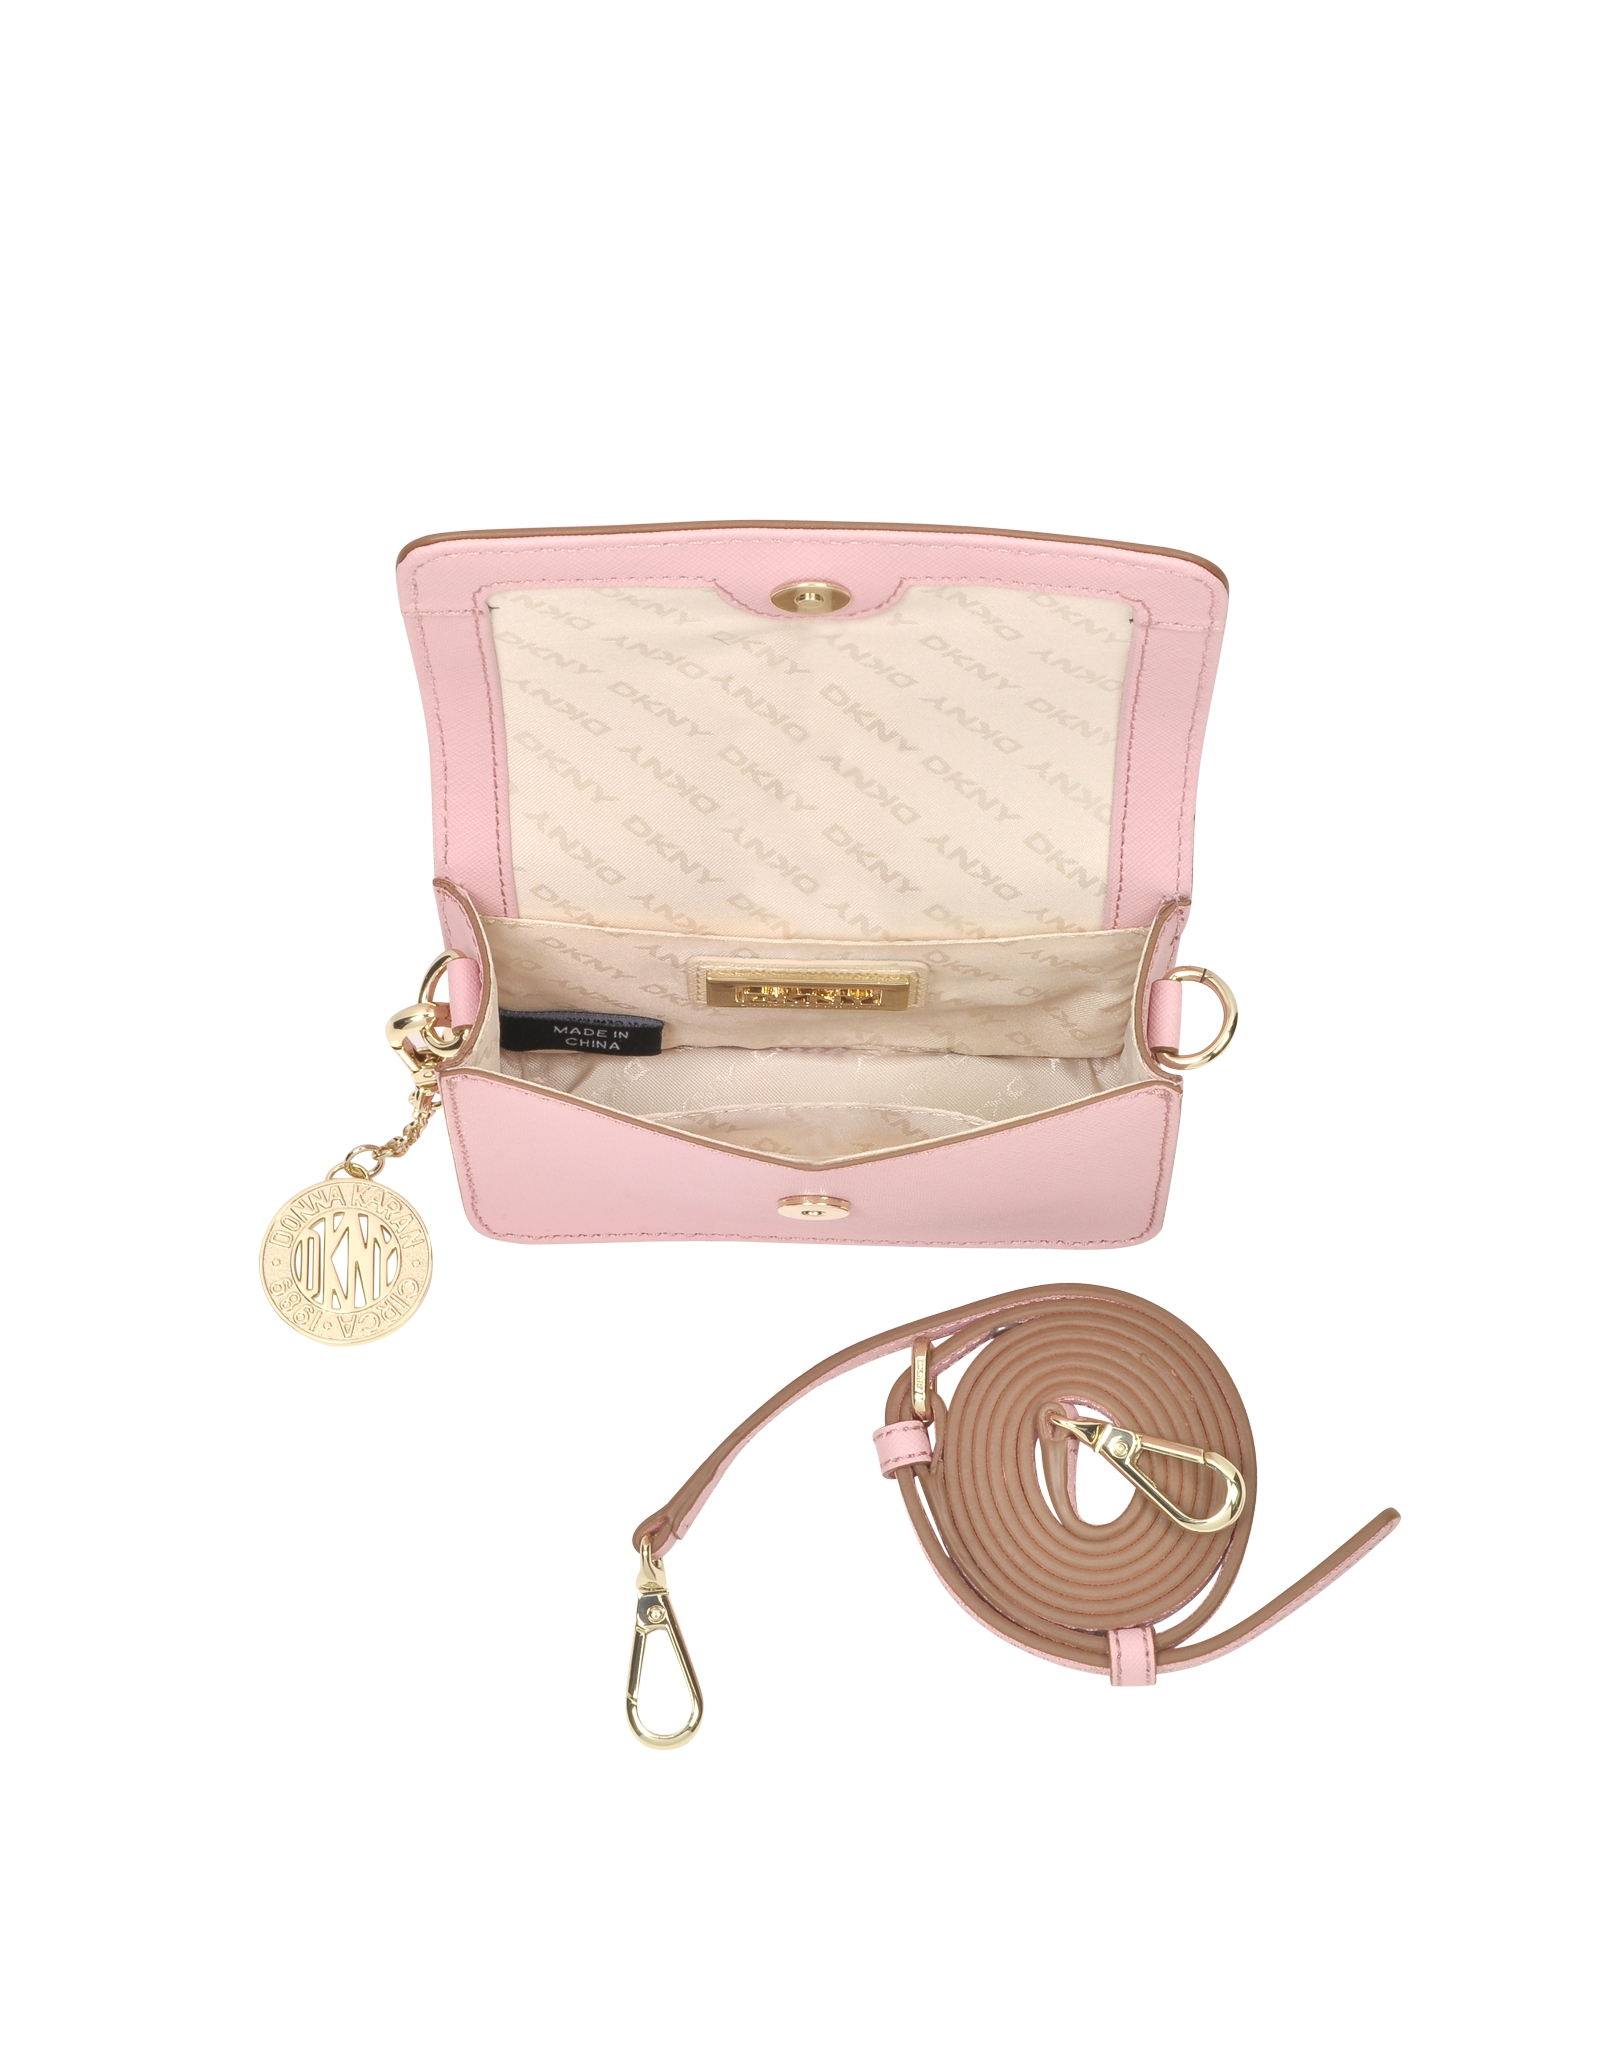 a6c046e0206 Dkny Bryant Park Mini Pink Saffiano Leather Crossbody Bag In Lyst